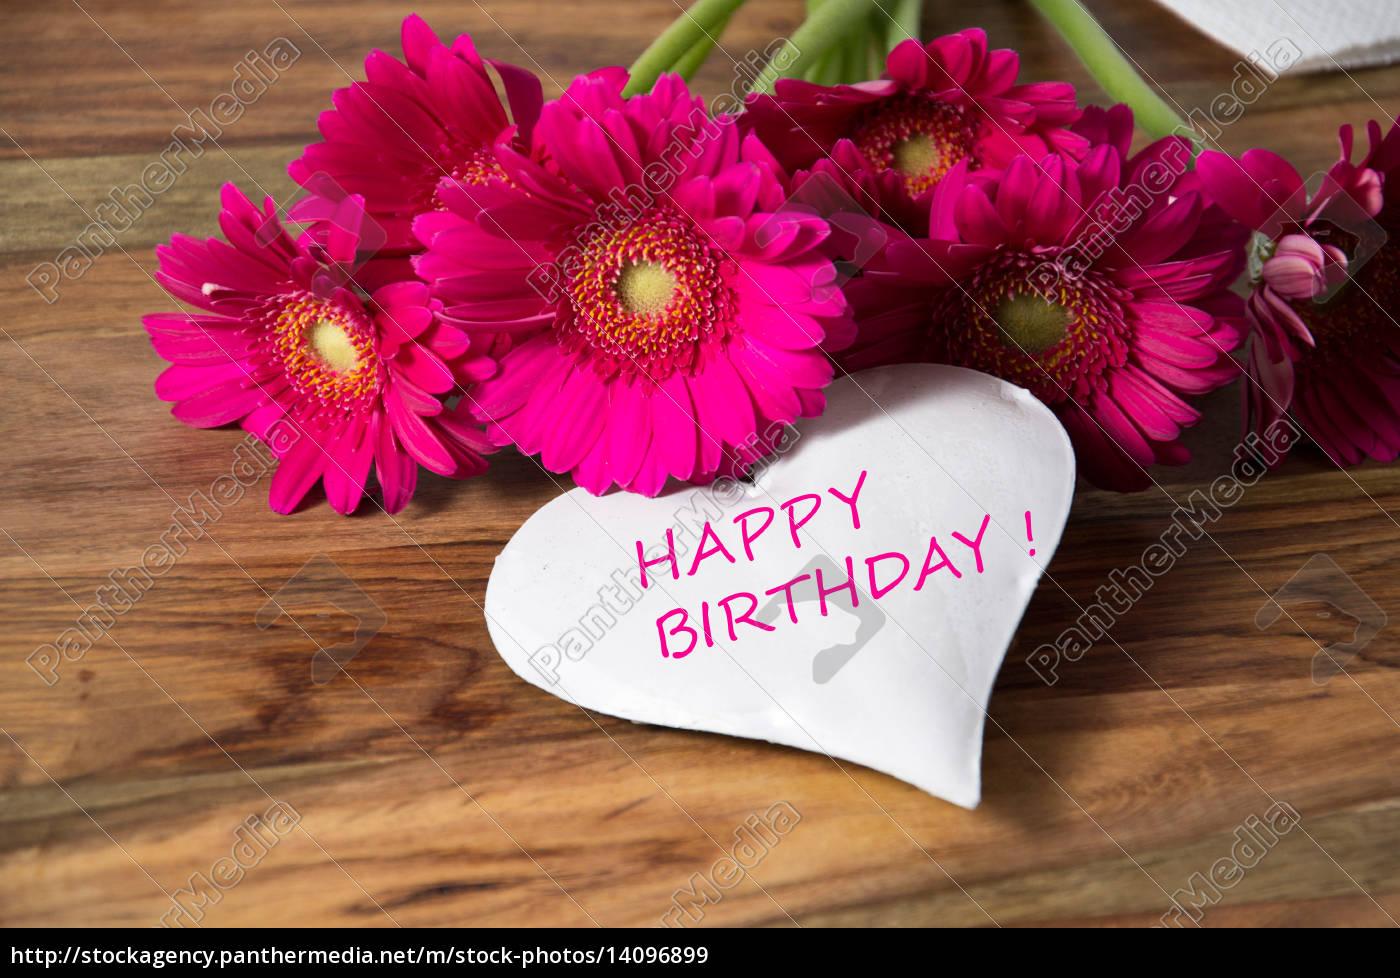 birthday - 14096899